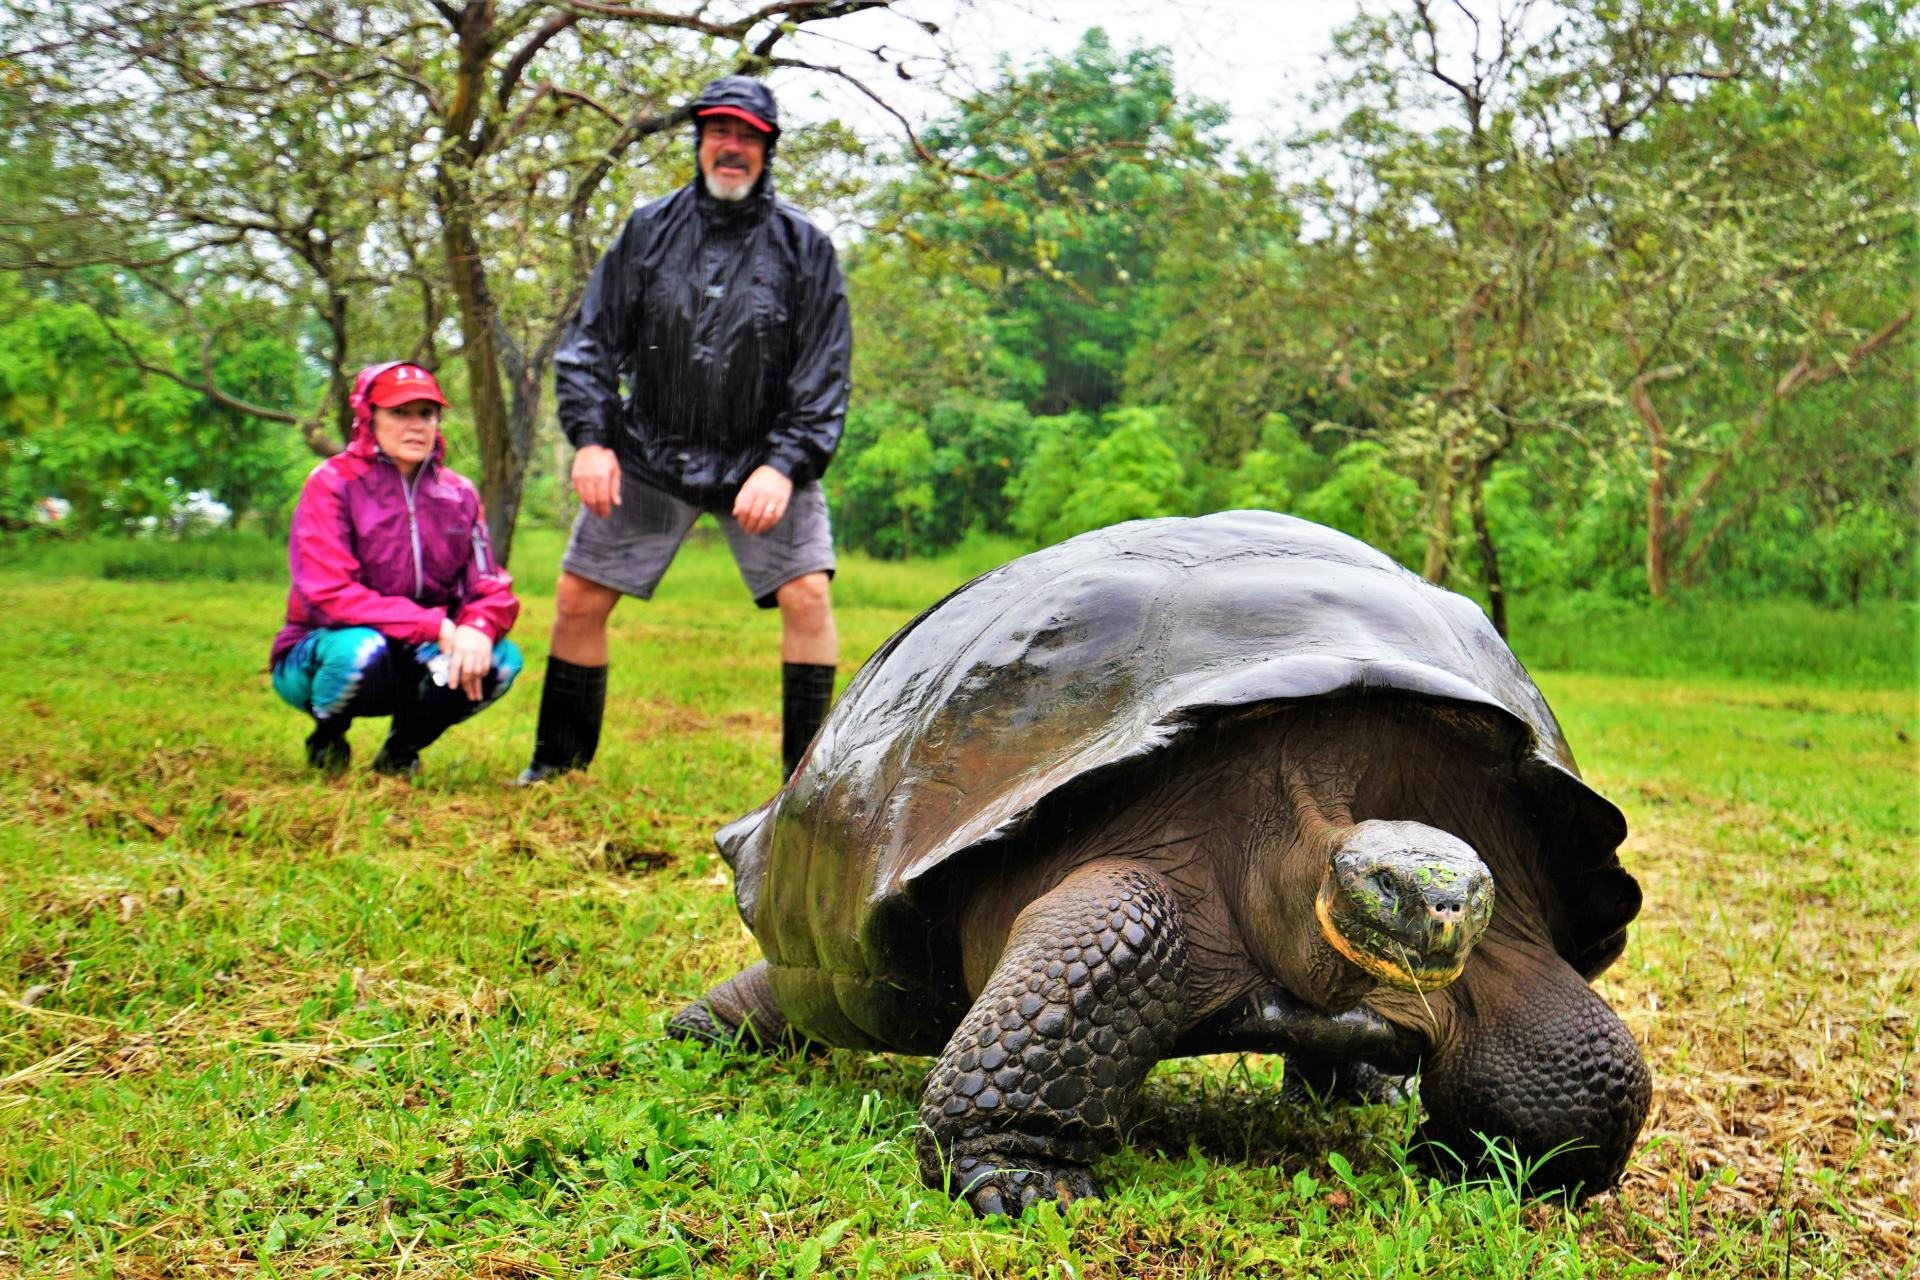 Giant Galapagos Land Tortoise